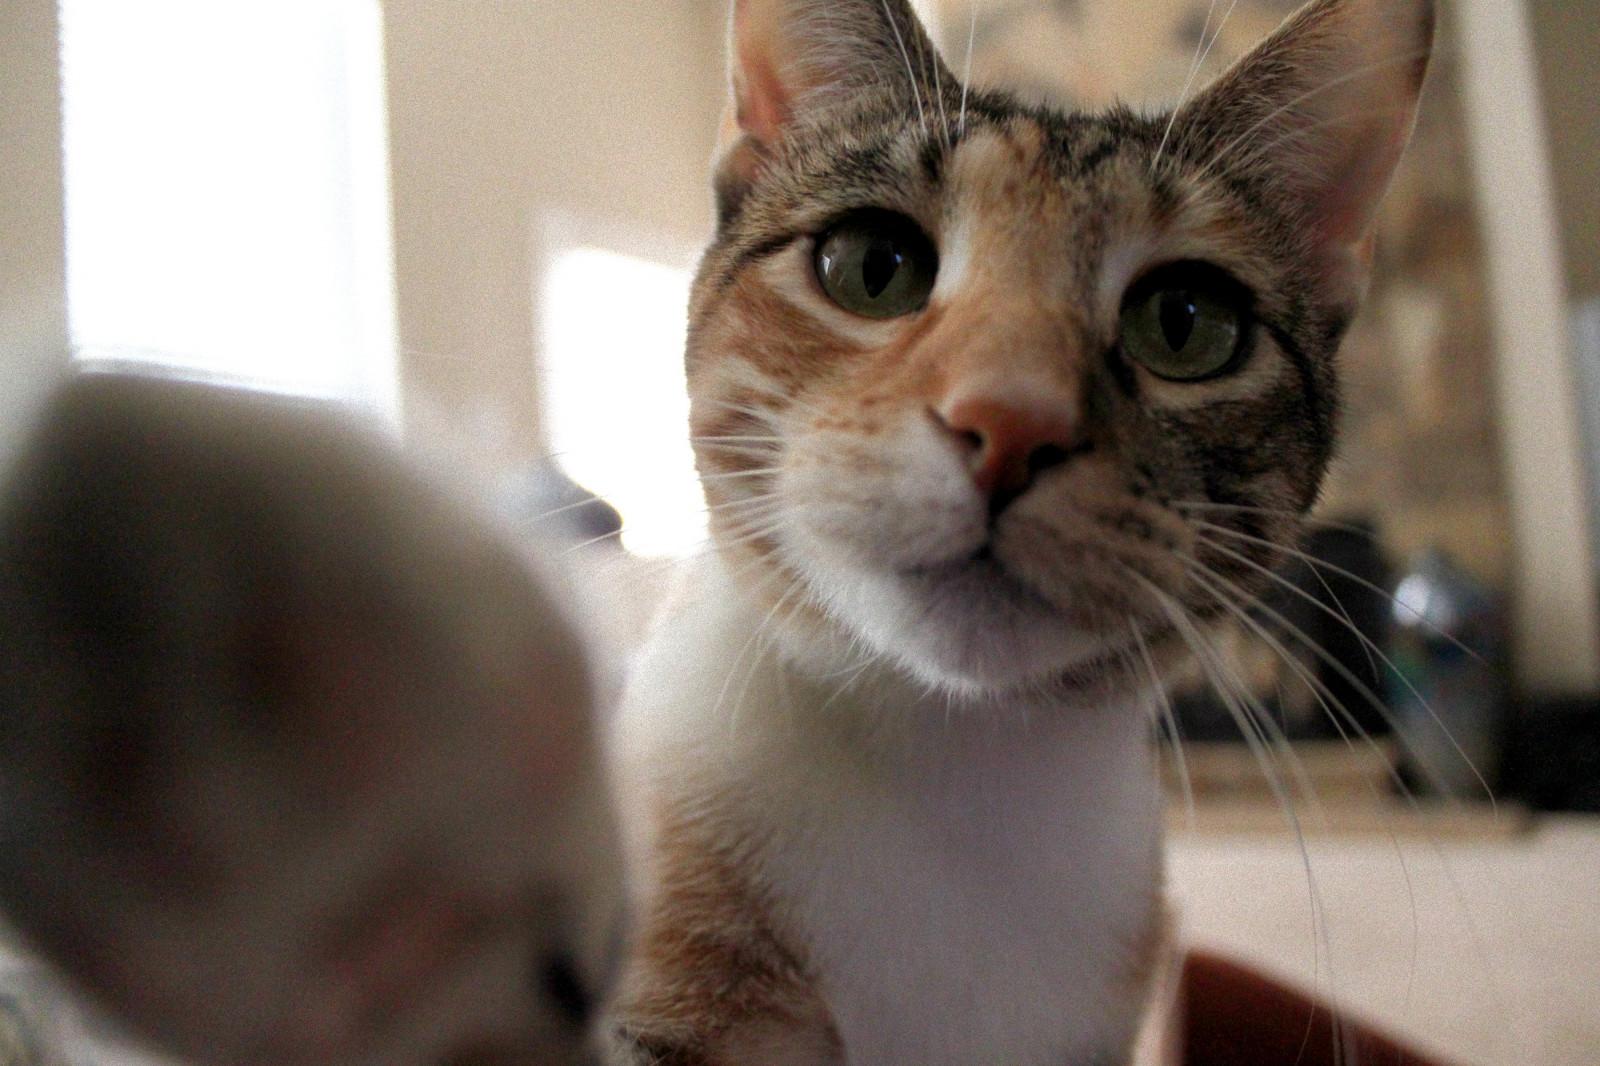 9476de3562 Fondos de pantalla : blanco, negro, gato, ventana, Ojos, cola, habitación,  rojo, asiático, verde, fuego, Canon, naranja, grano, pelaje, nariz, bigotes,  oro, ...